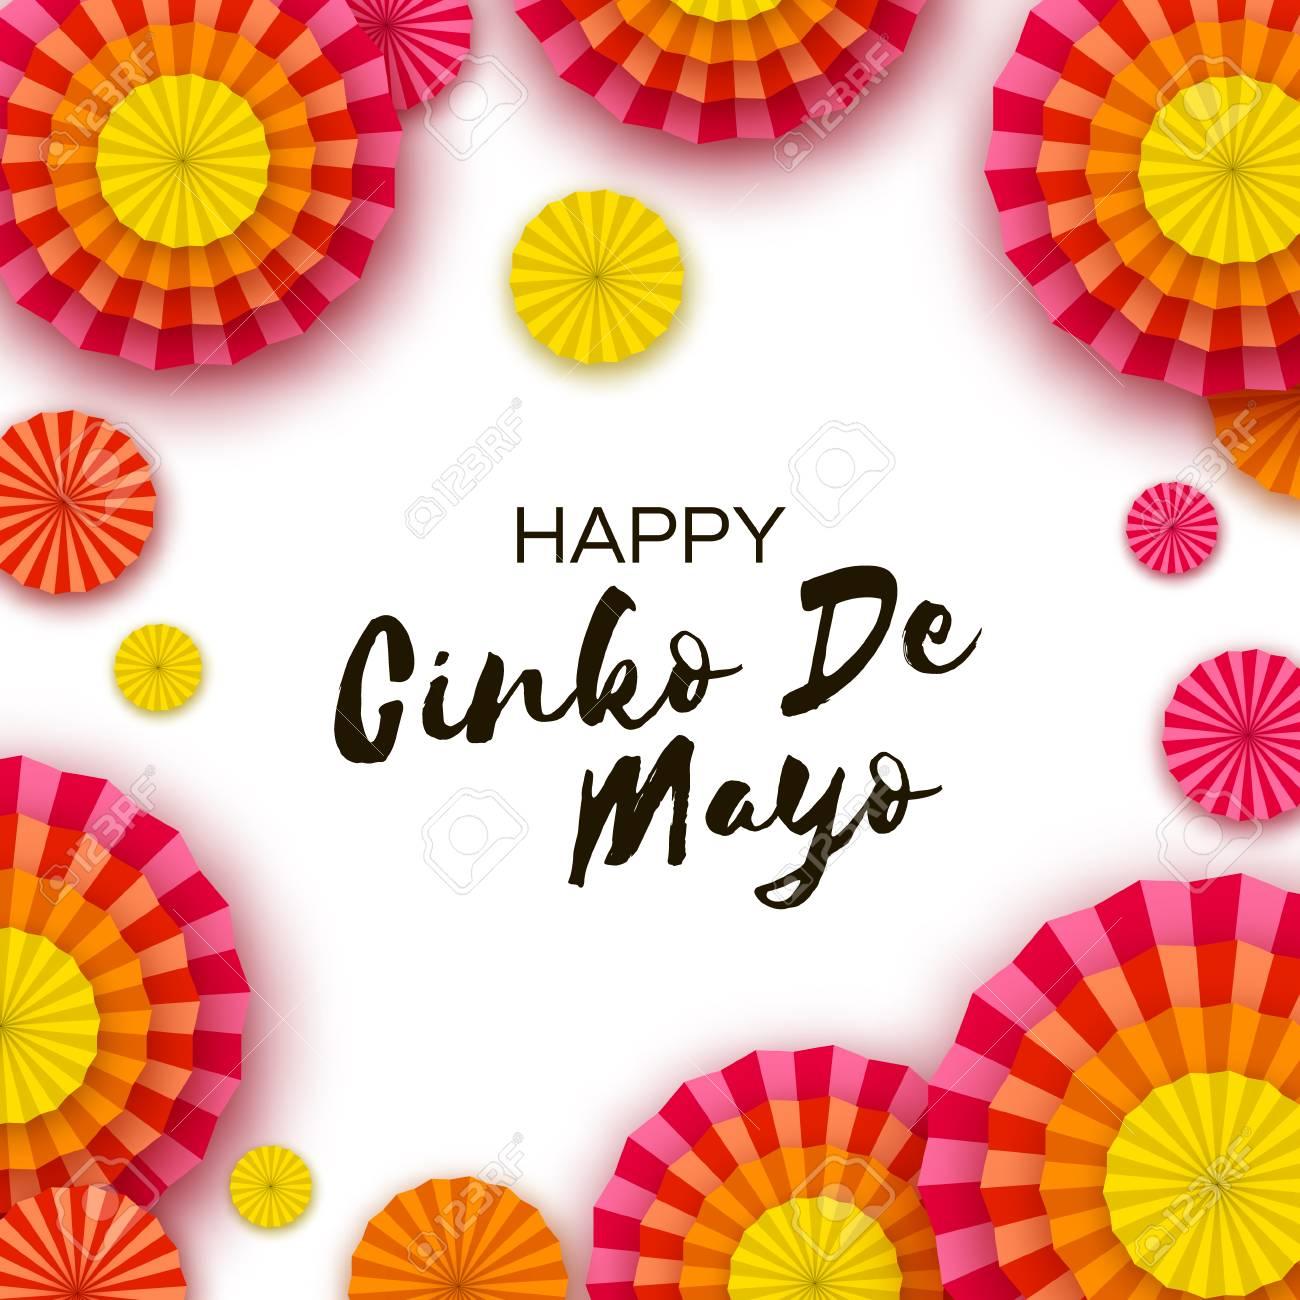 Happy Cinco De Mayo Greeting Card Colorful Paper Fan Mexico